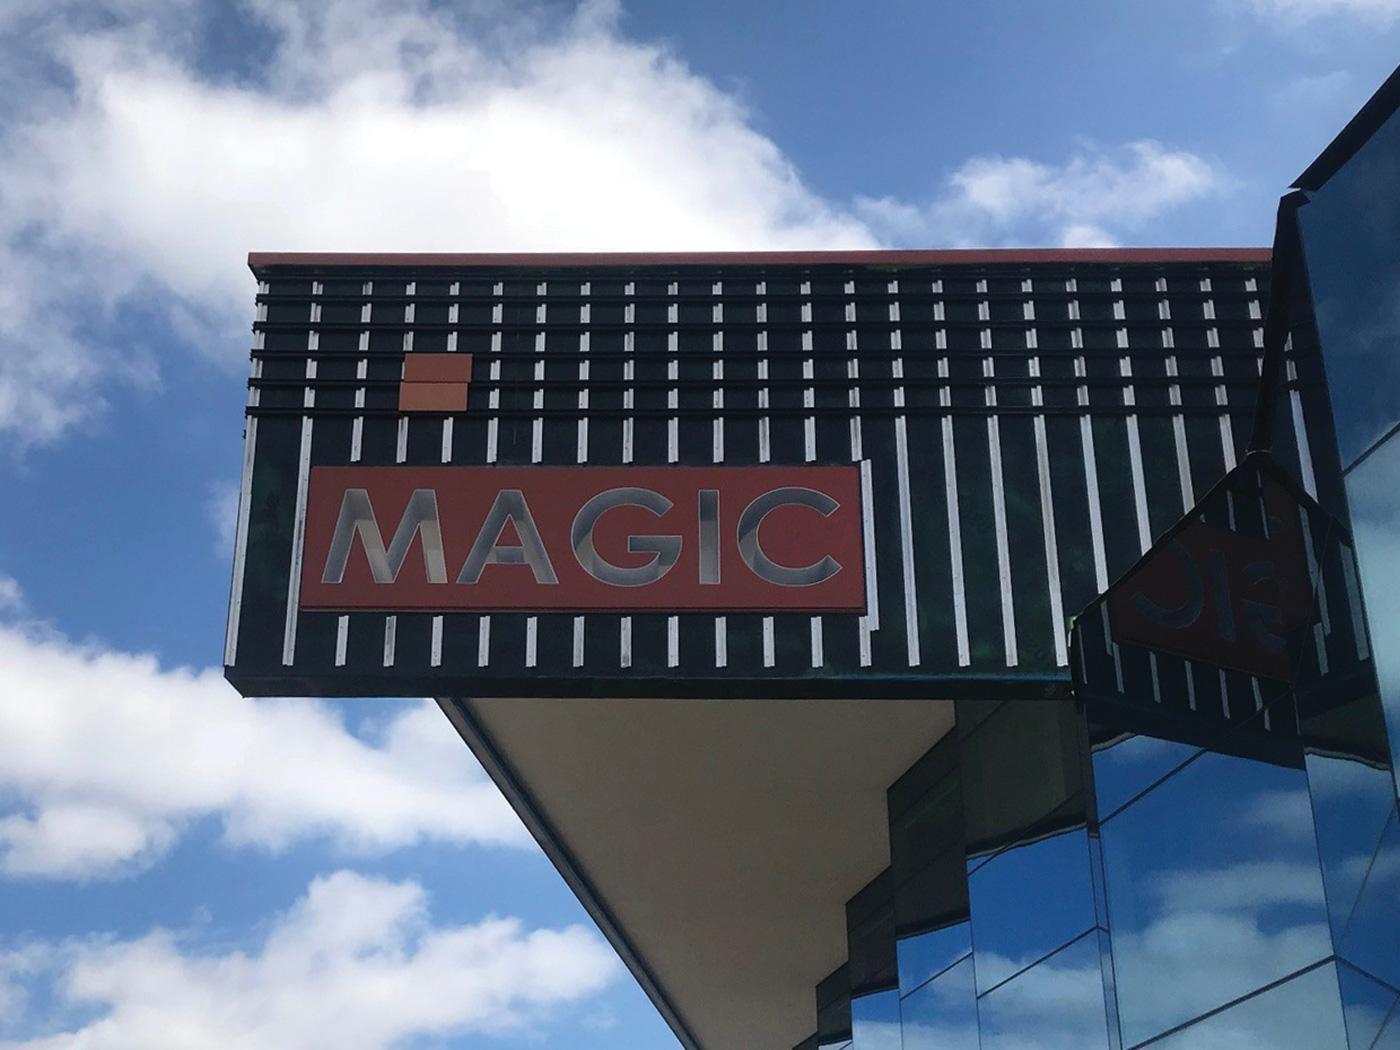 RIT MAGIC Spell Studios